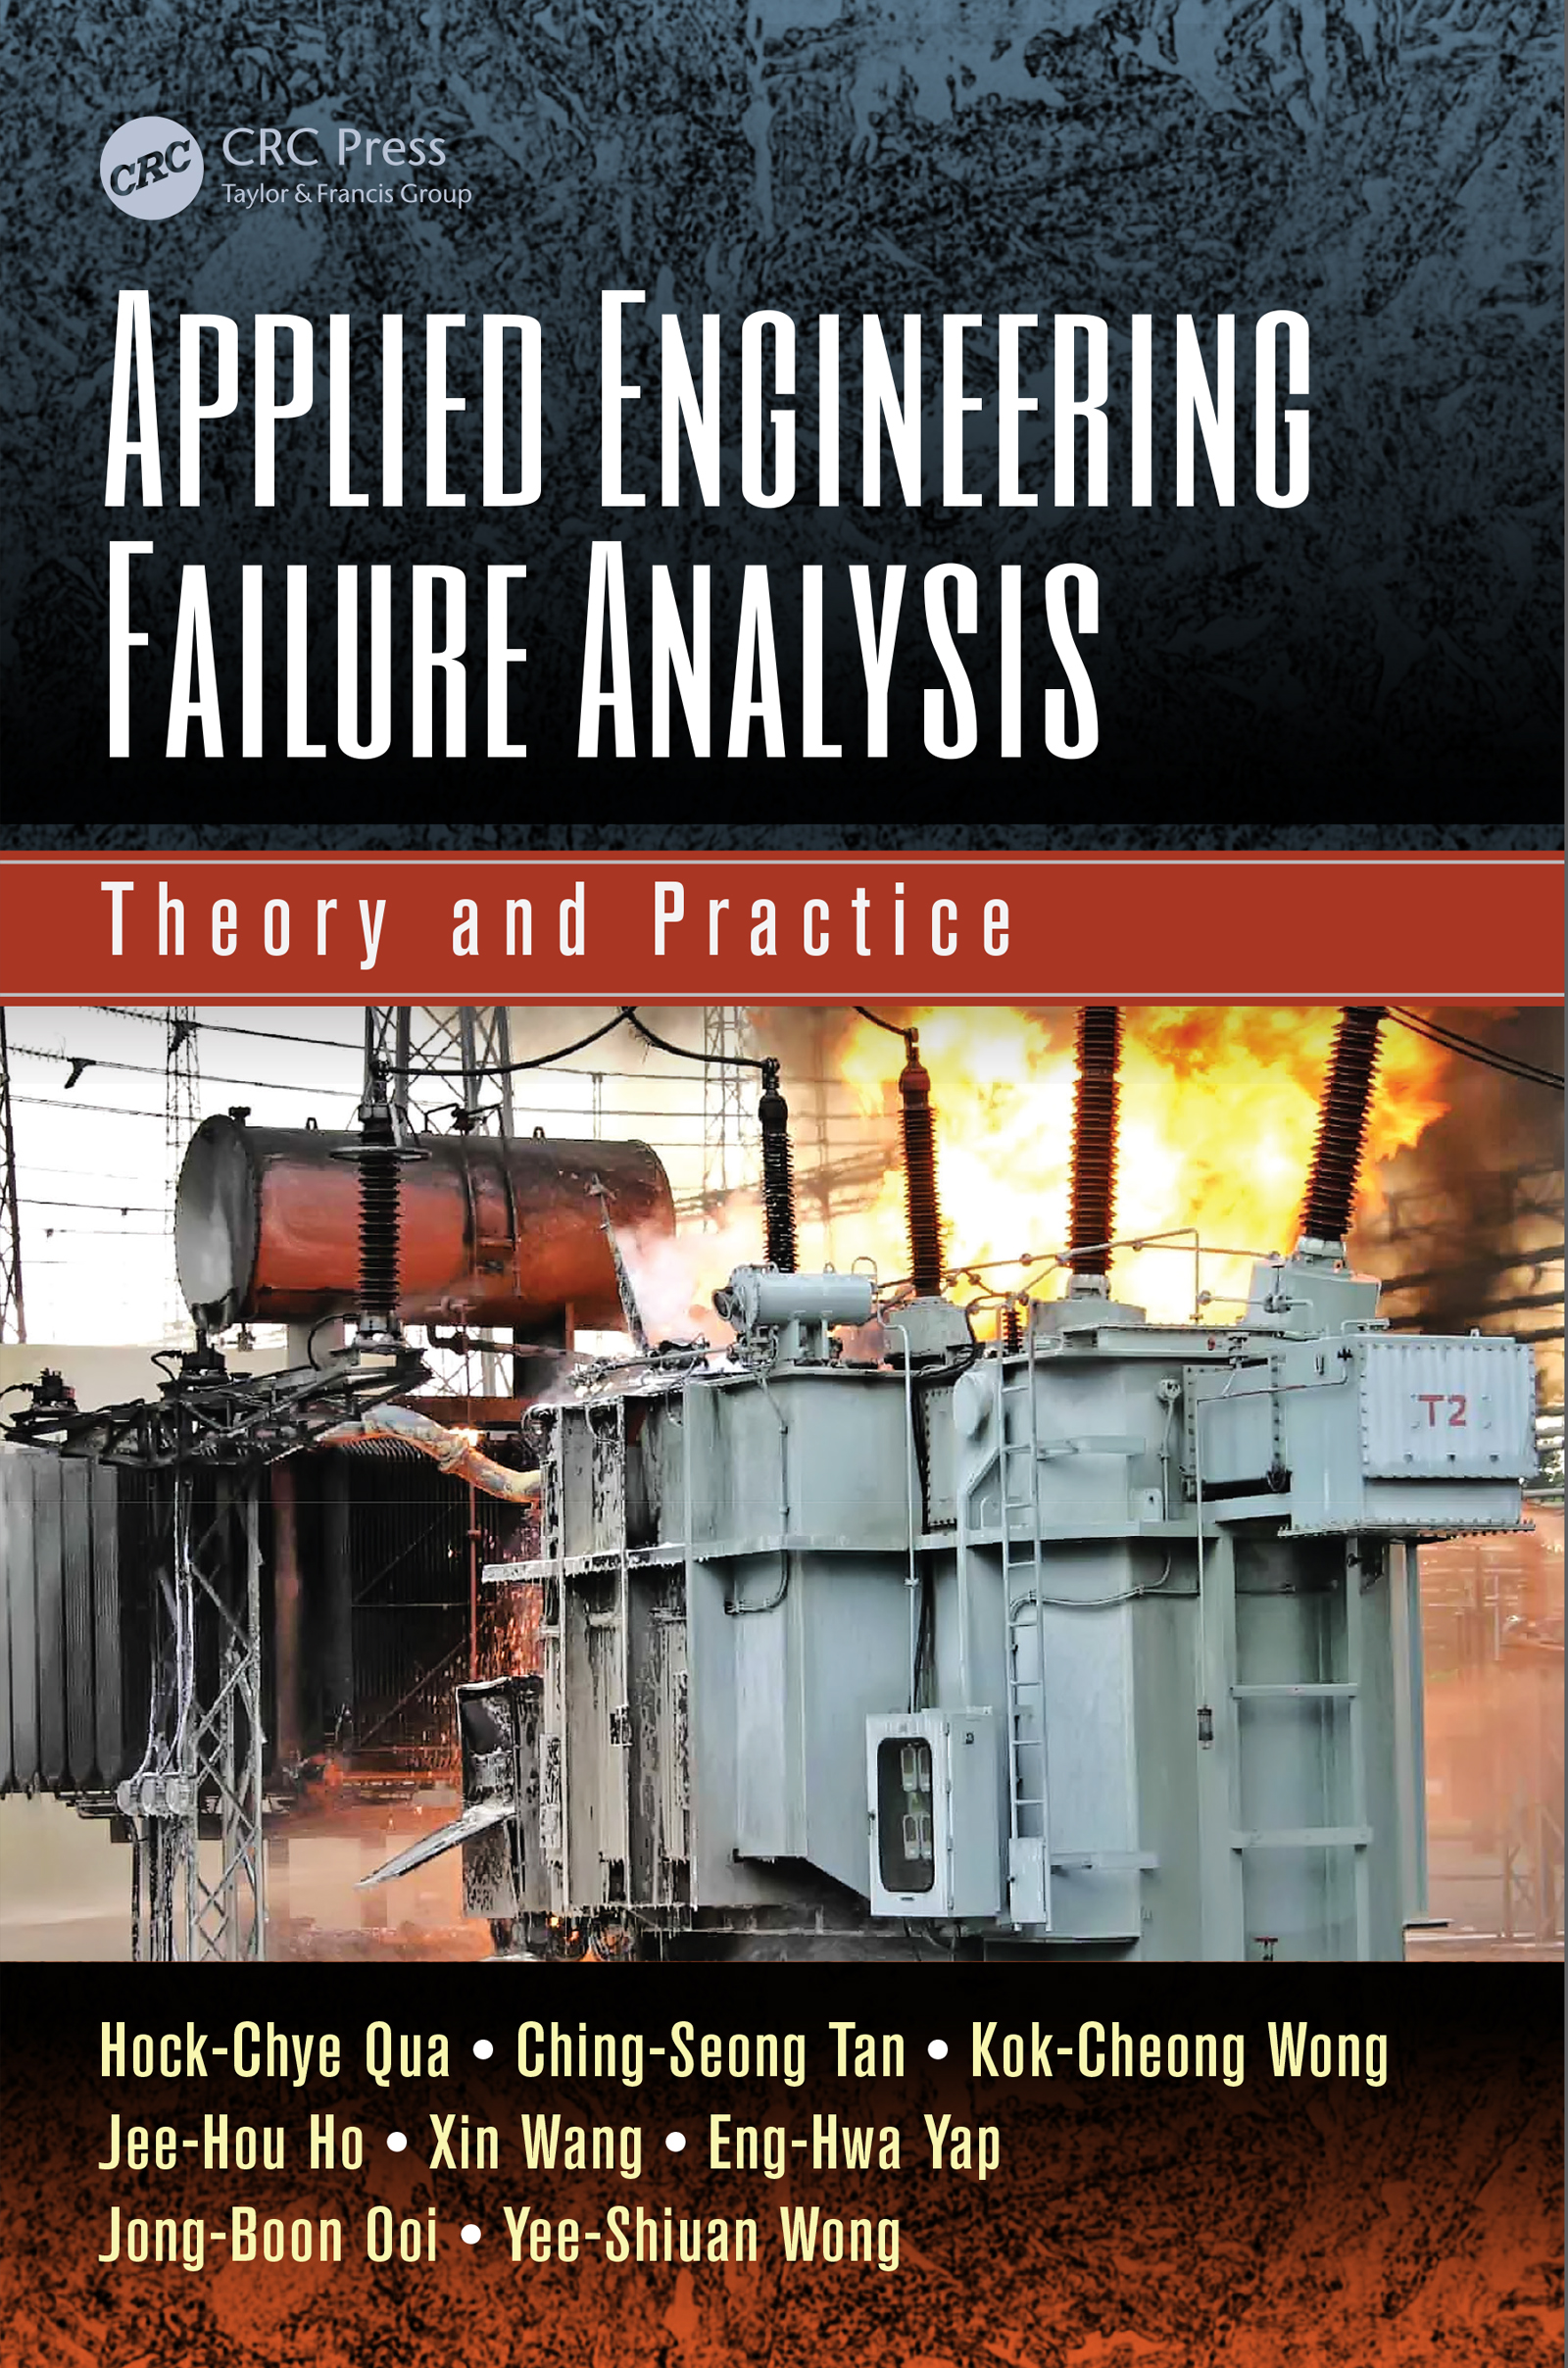 Applied Engineering Failure Analysis